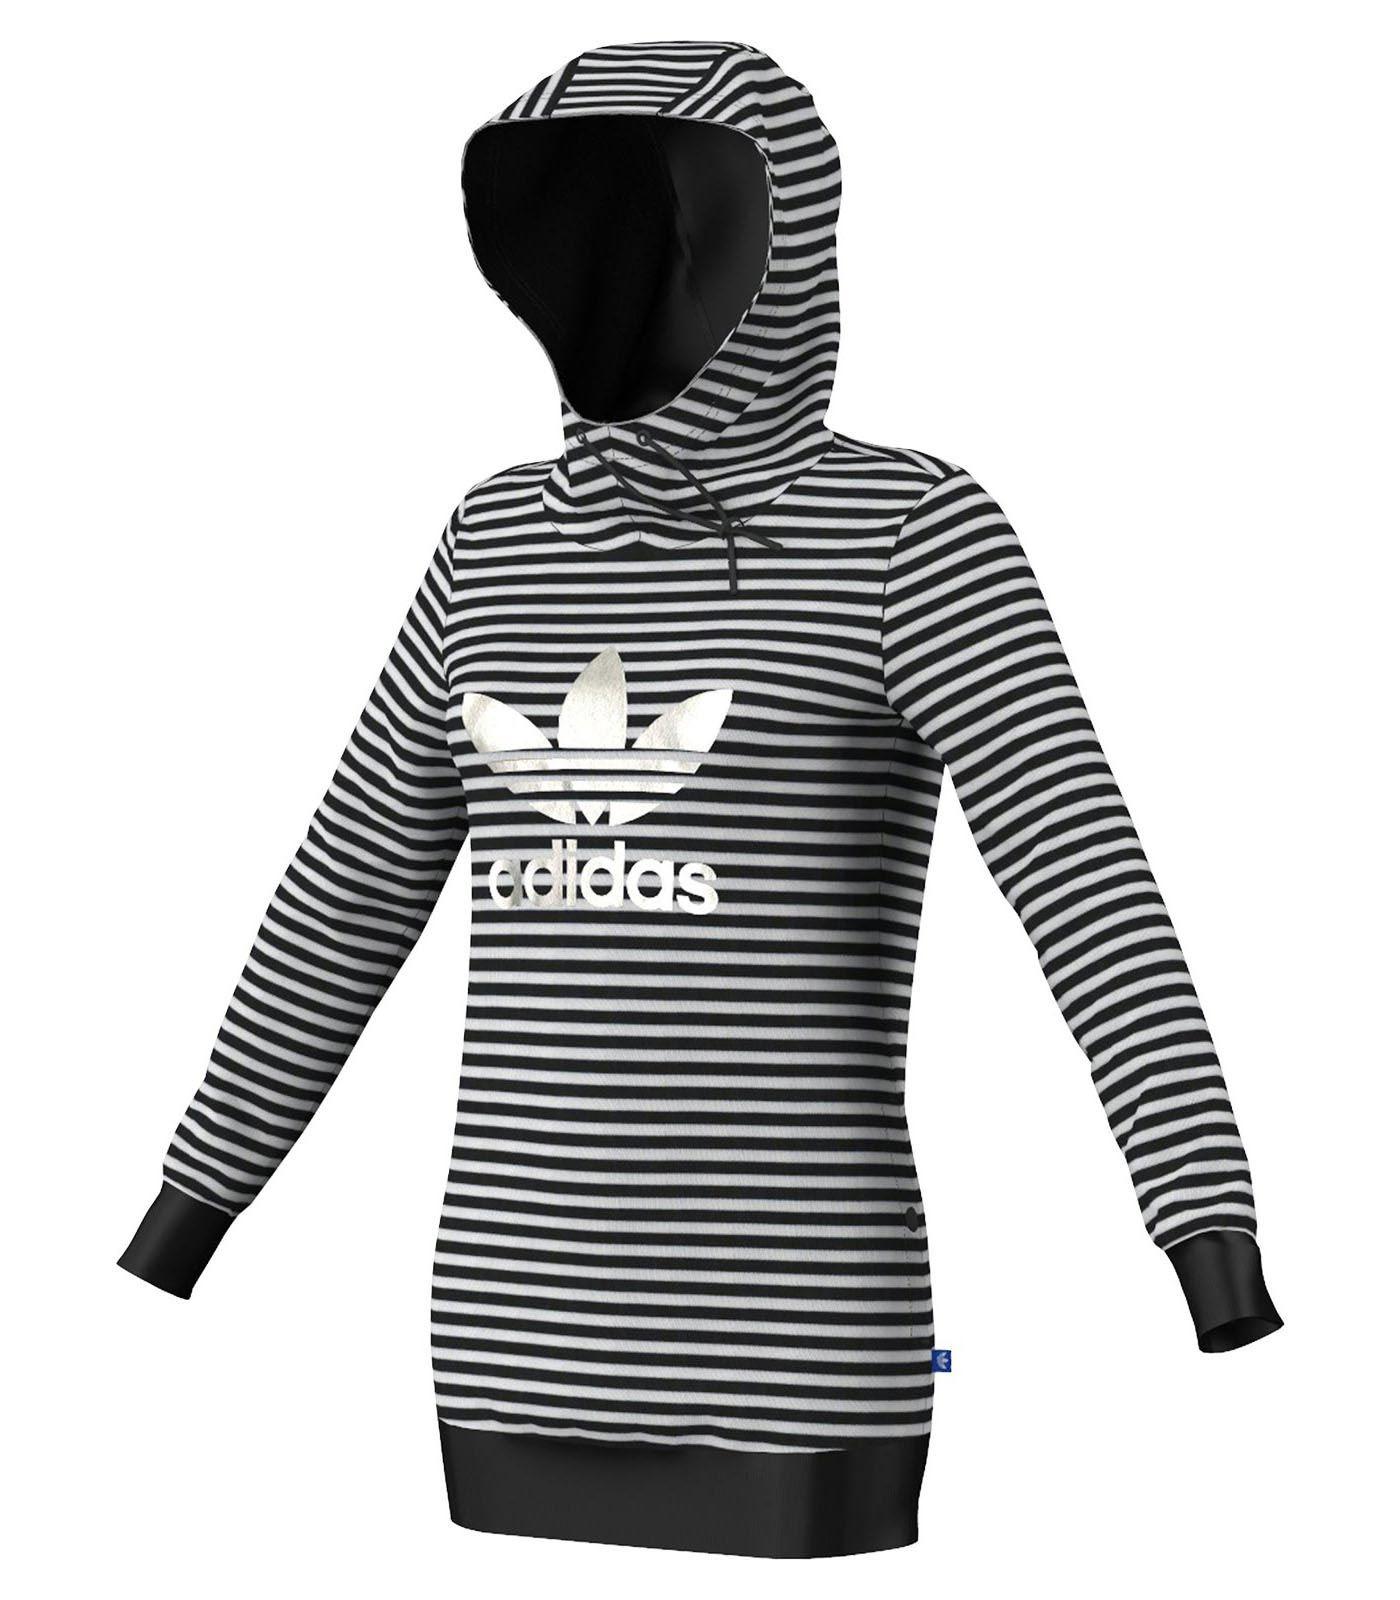 Adidas Originals Striped Logo - Vêtements - Femme - Chandails - Sports  Experts eb9cf738e72